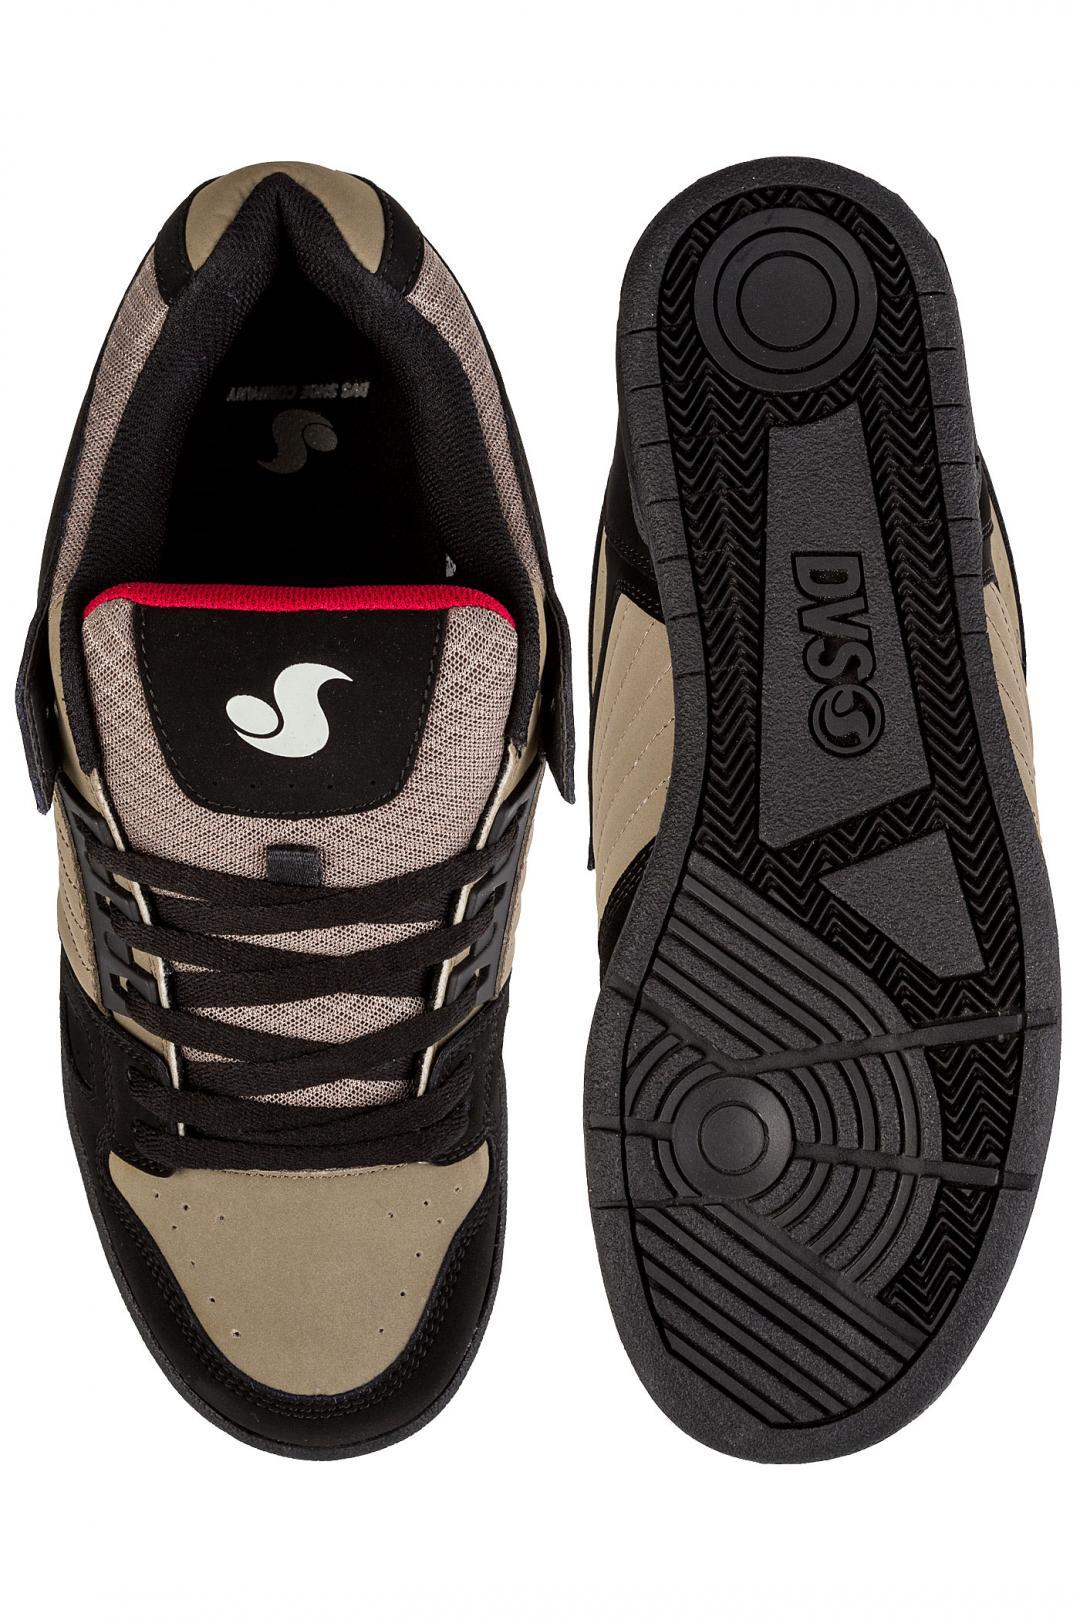 Uomo DVS Celsius Nubuck black taupe   Sneakers low top